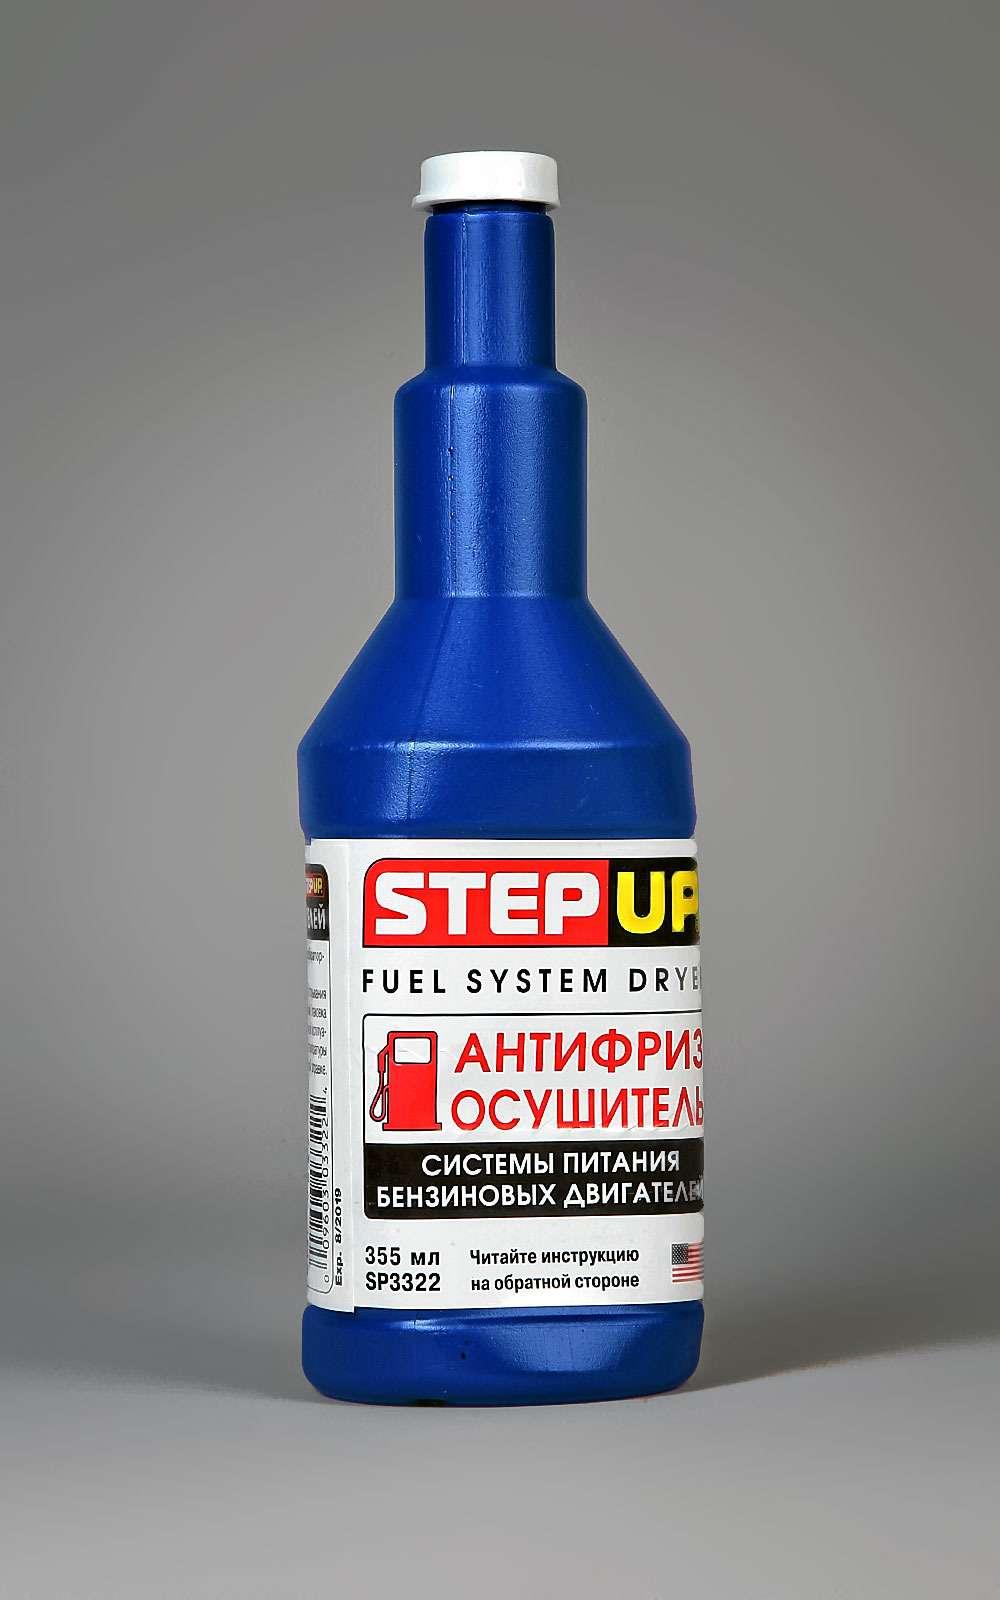 Step UpFuel System Dryer, США